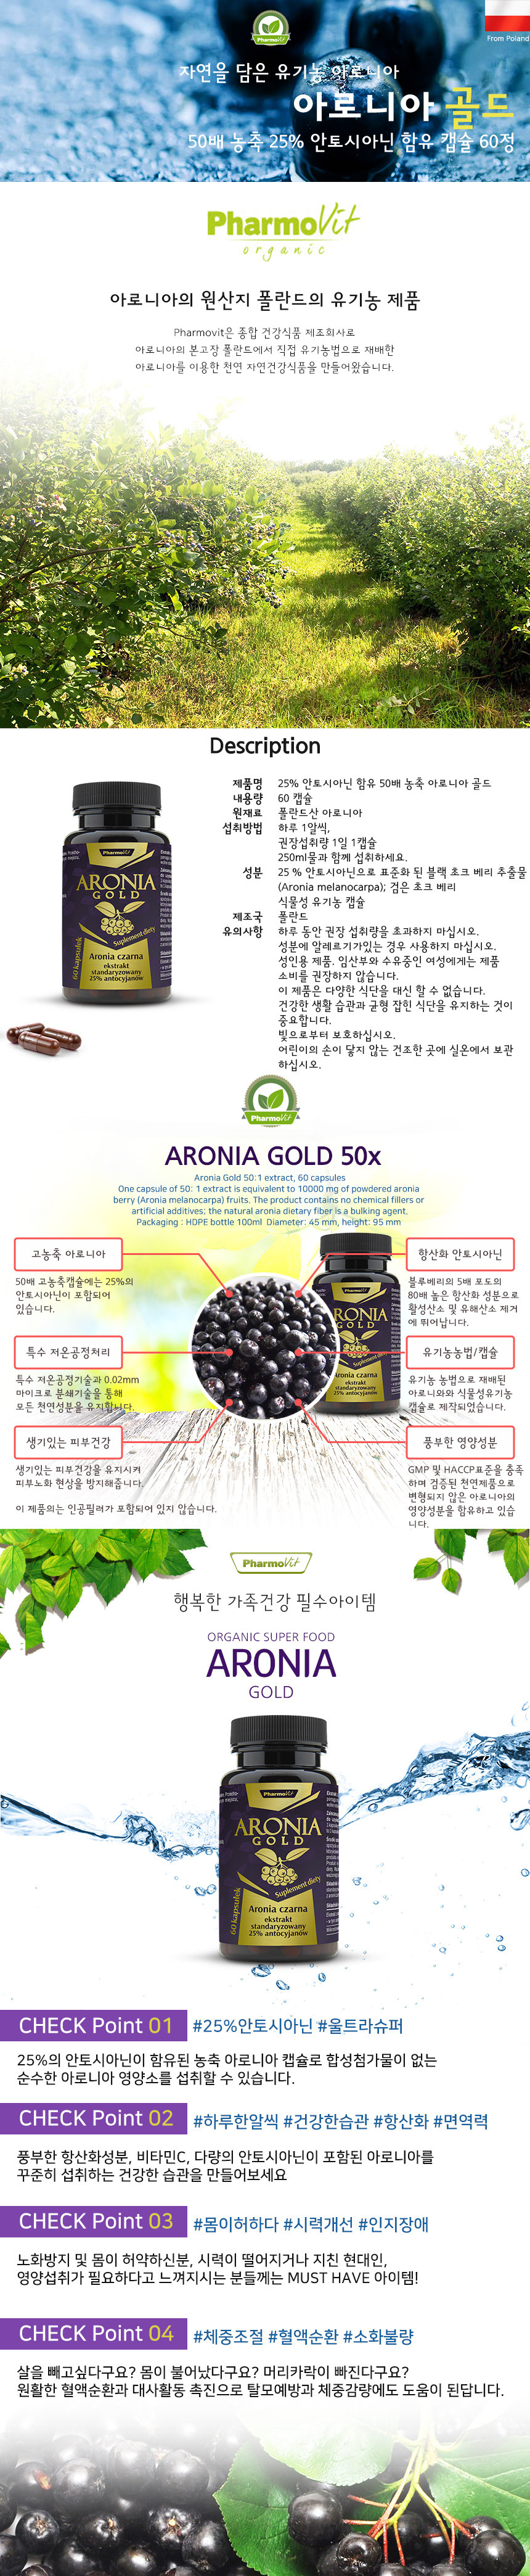 aronia_gold.jpg